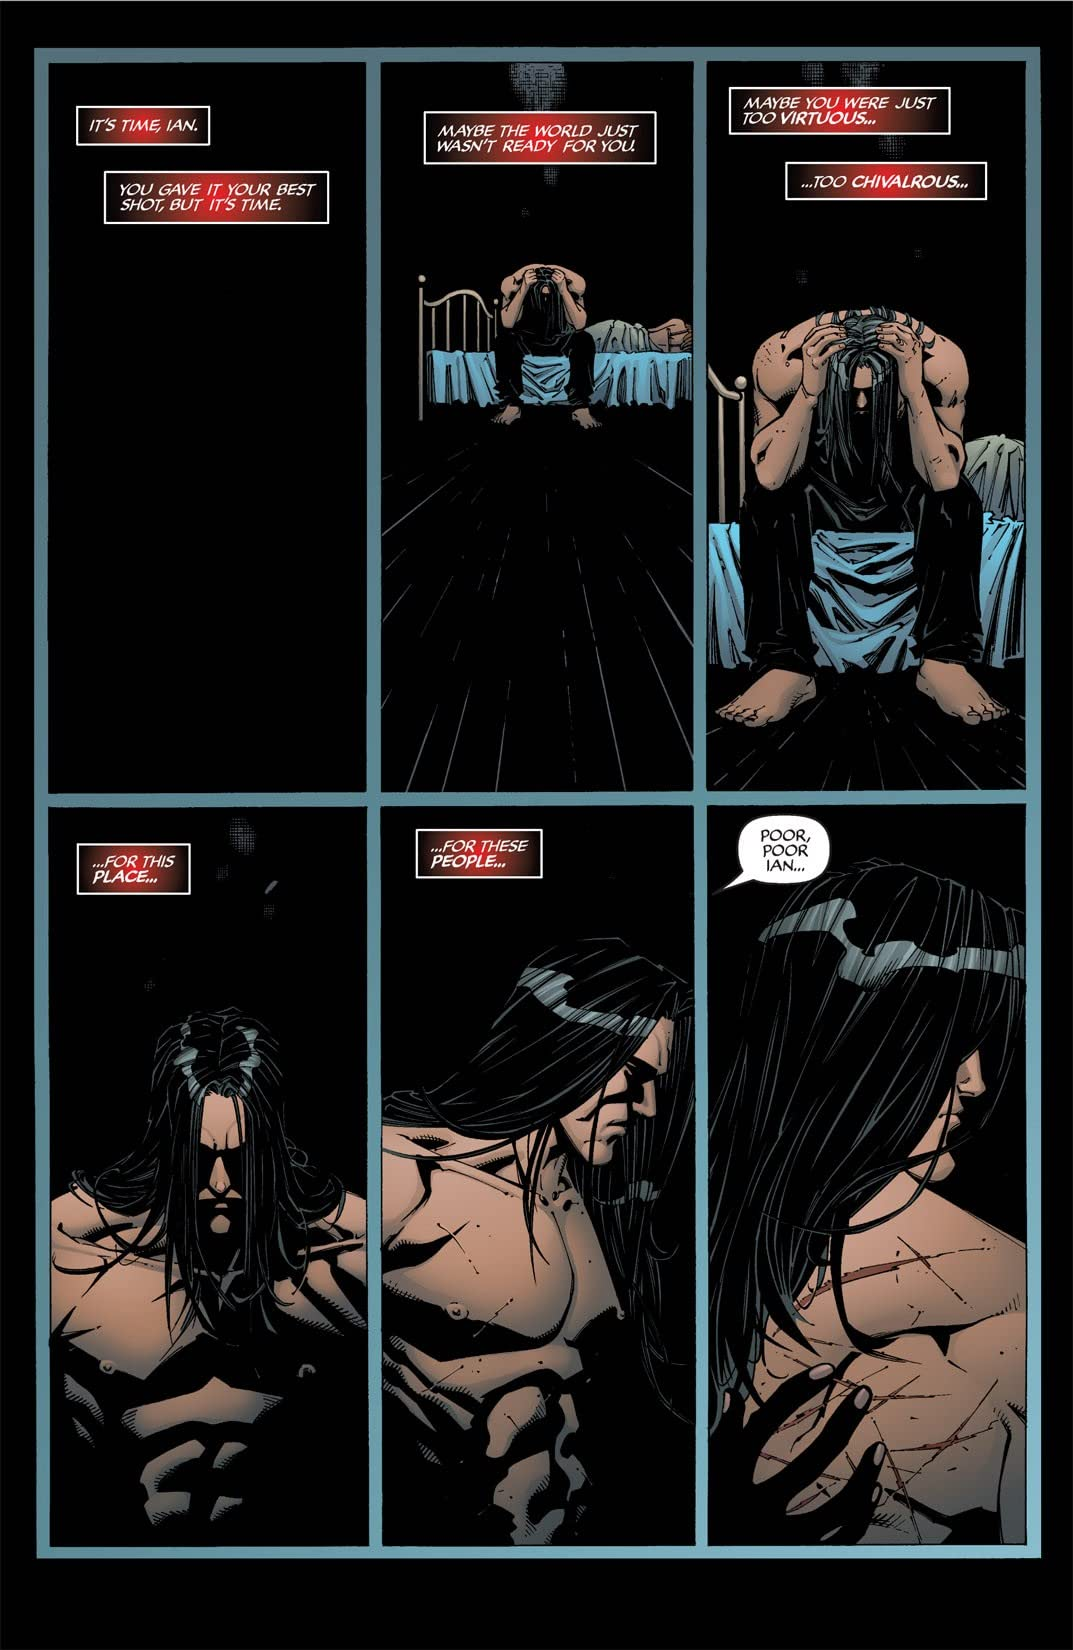 Witchblade #56